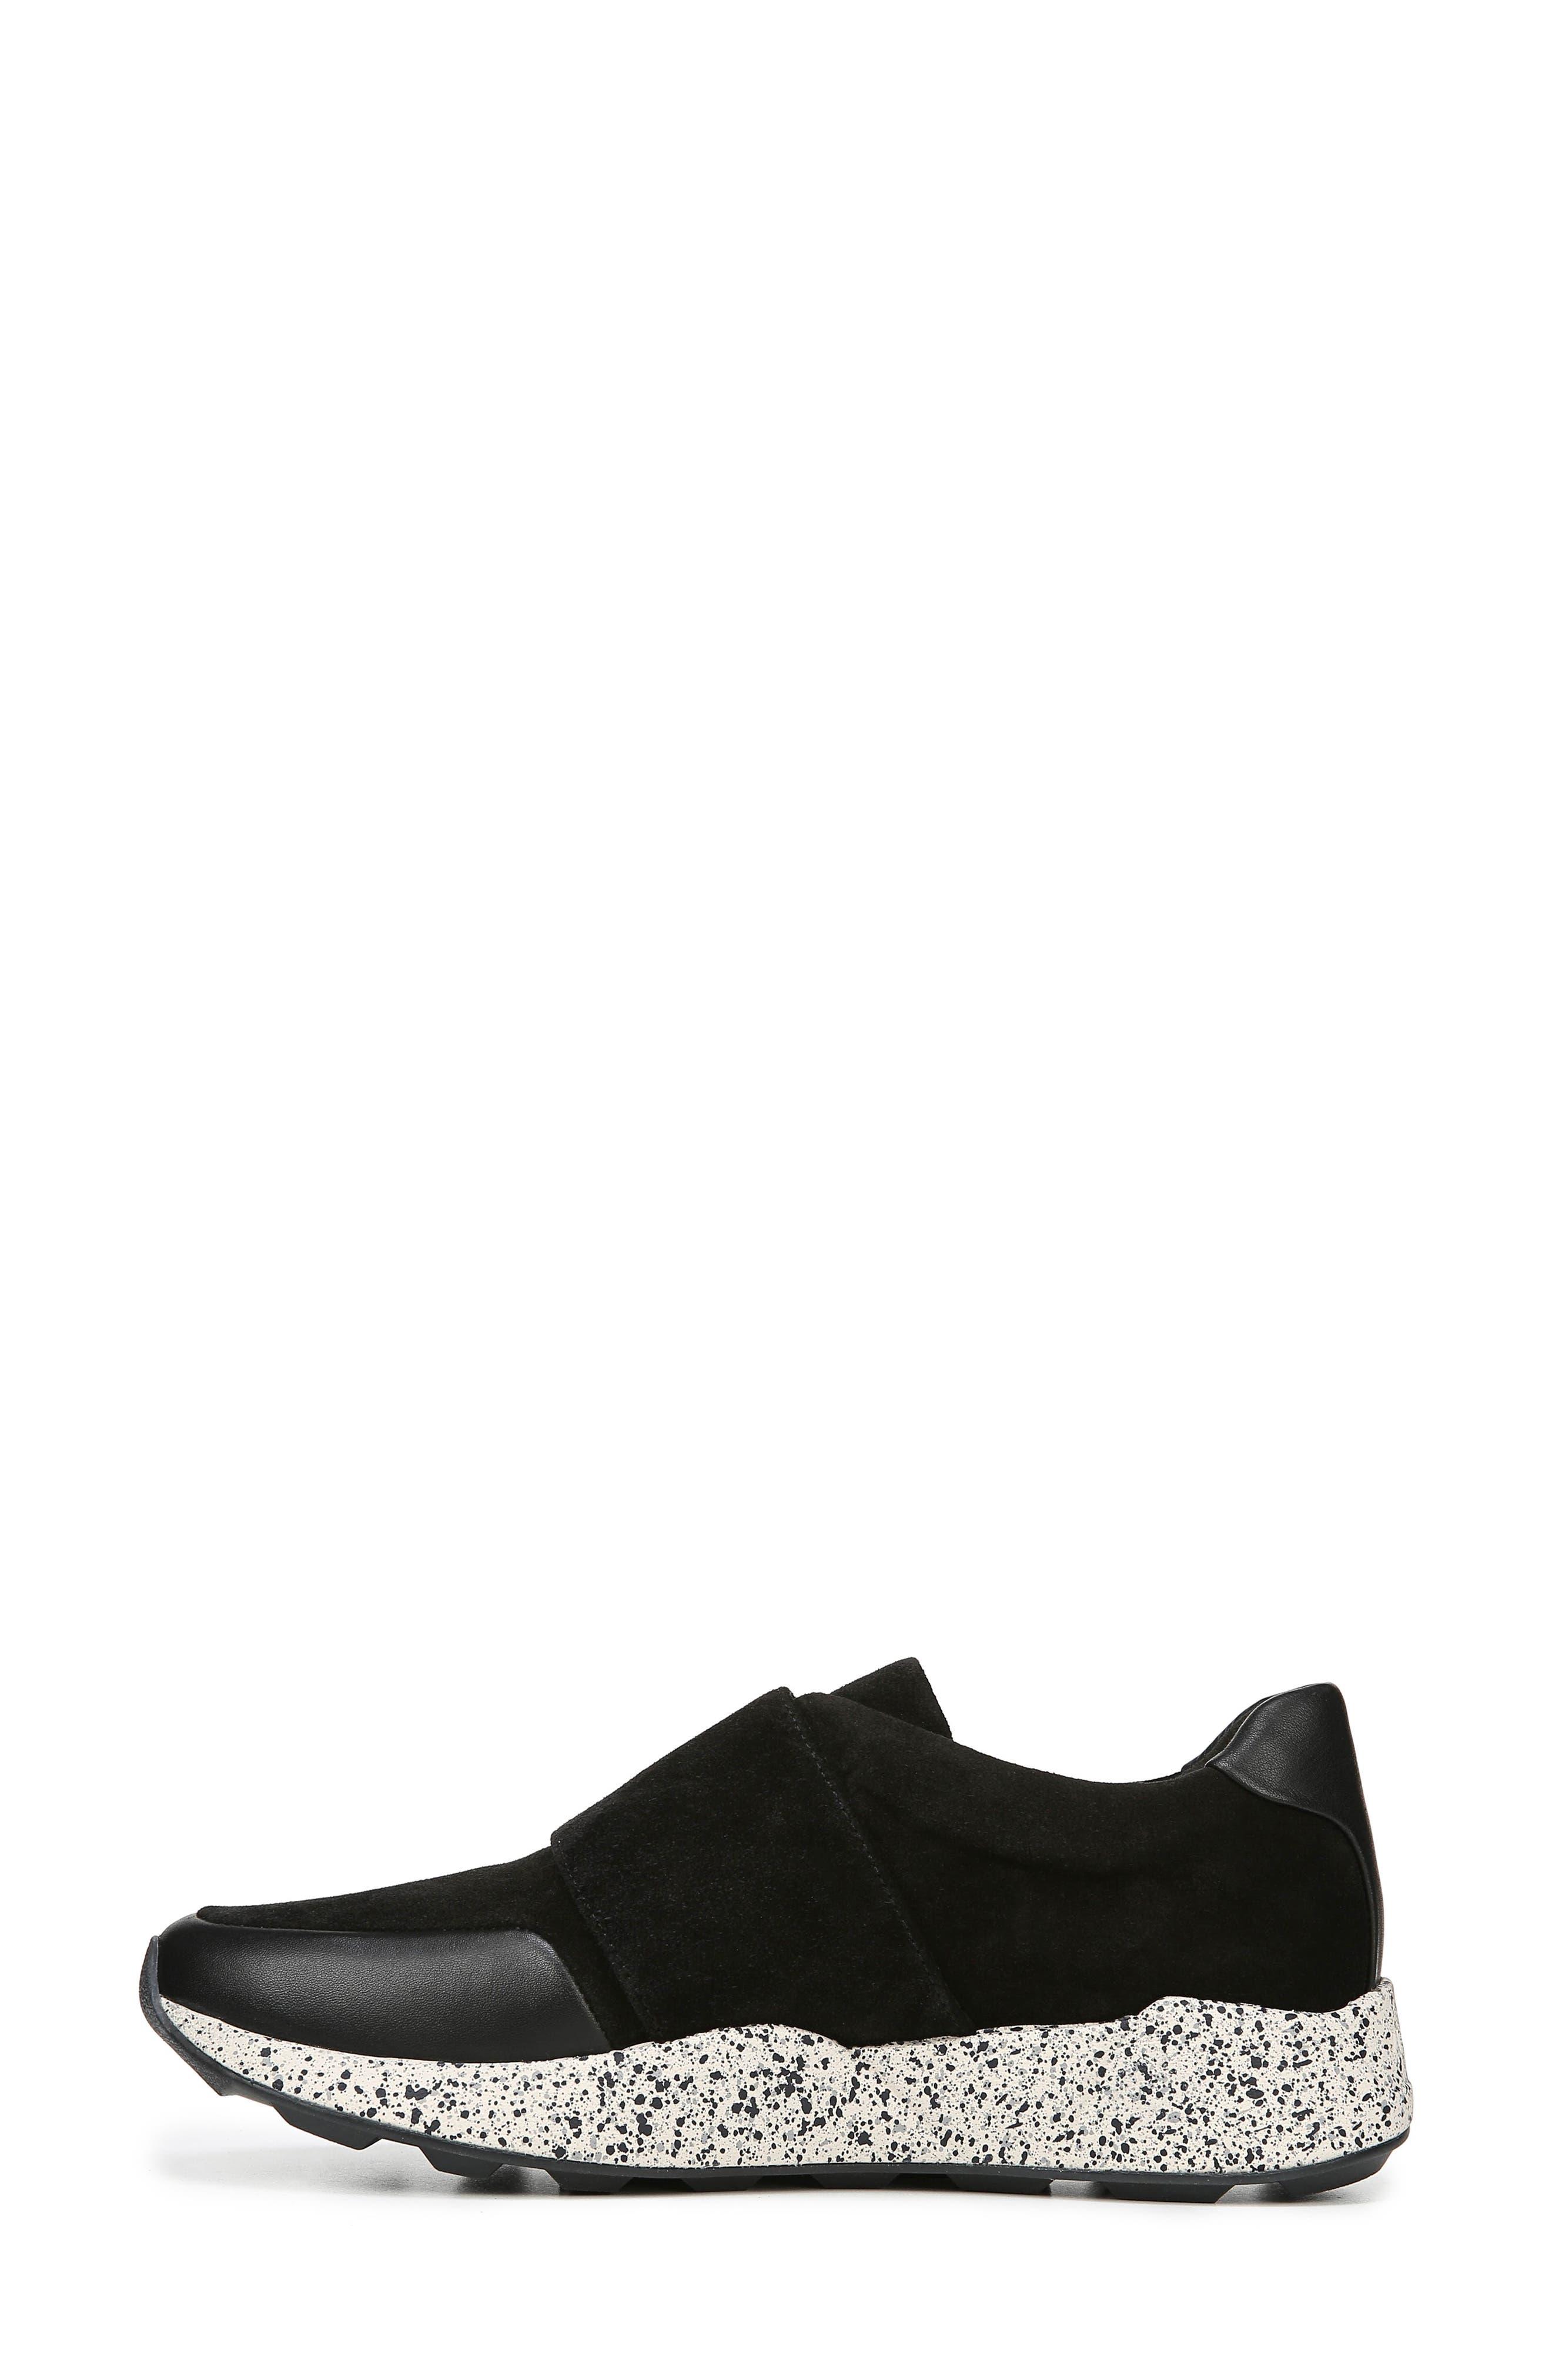 Gage Sneaker,                             Alternate thumbnail 8, color,                             BLACK COCO